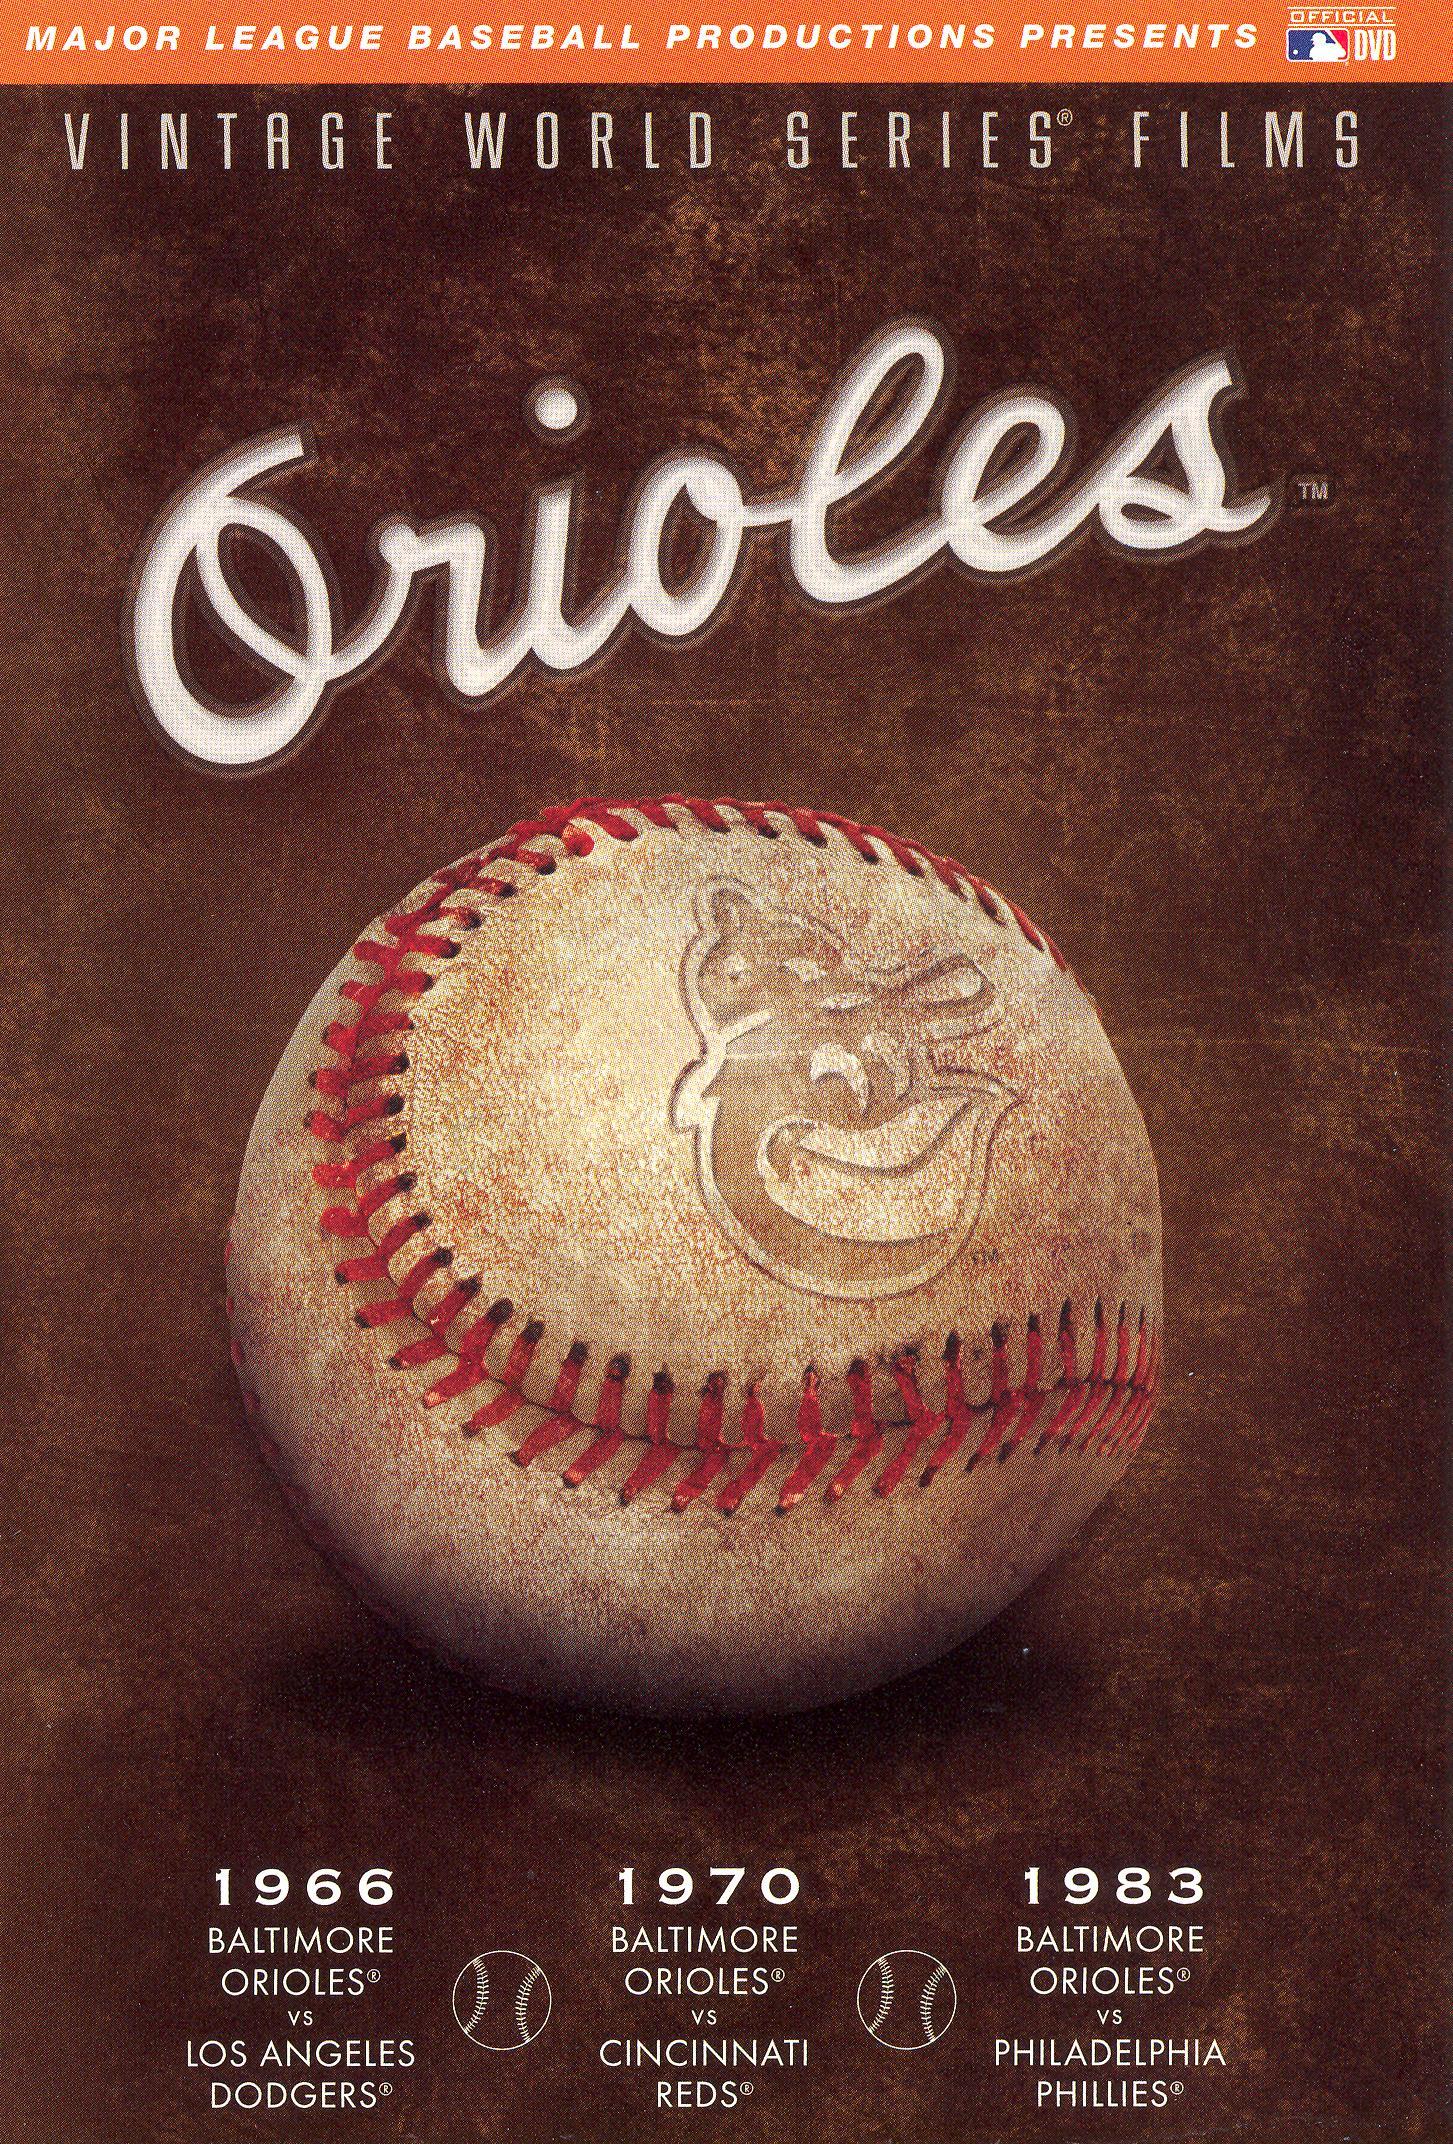 Vintage World Series Films: Baltimore Orioles